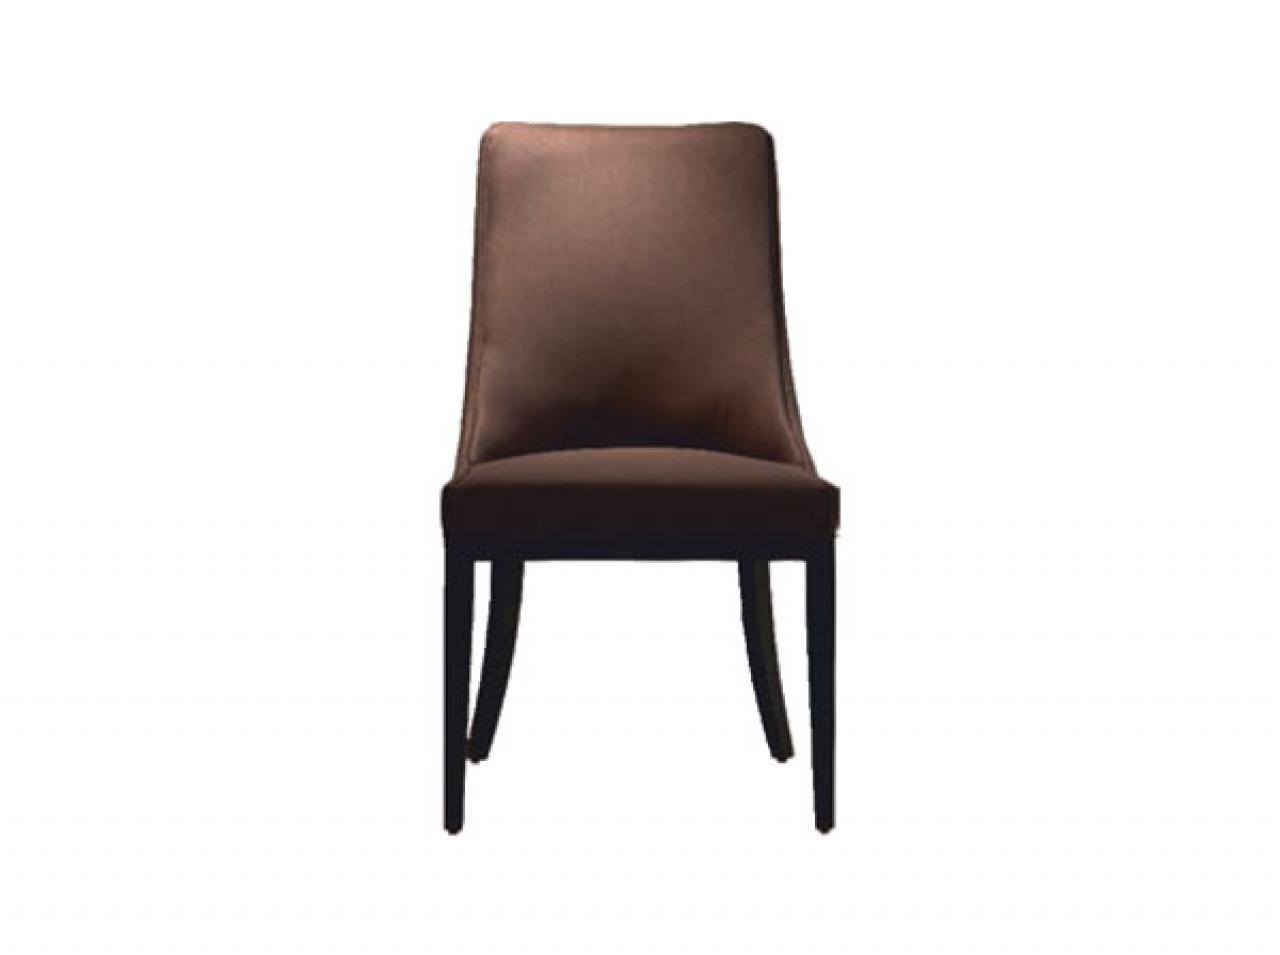 327 Sandalye